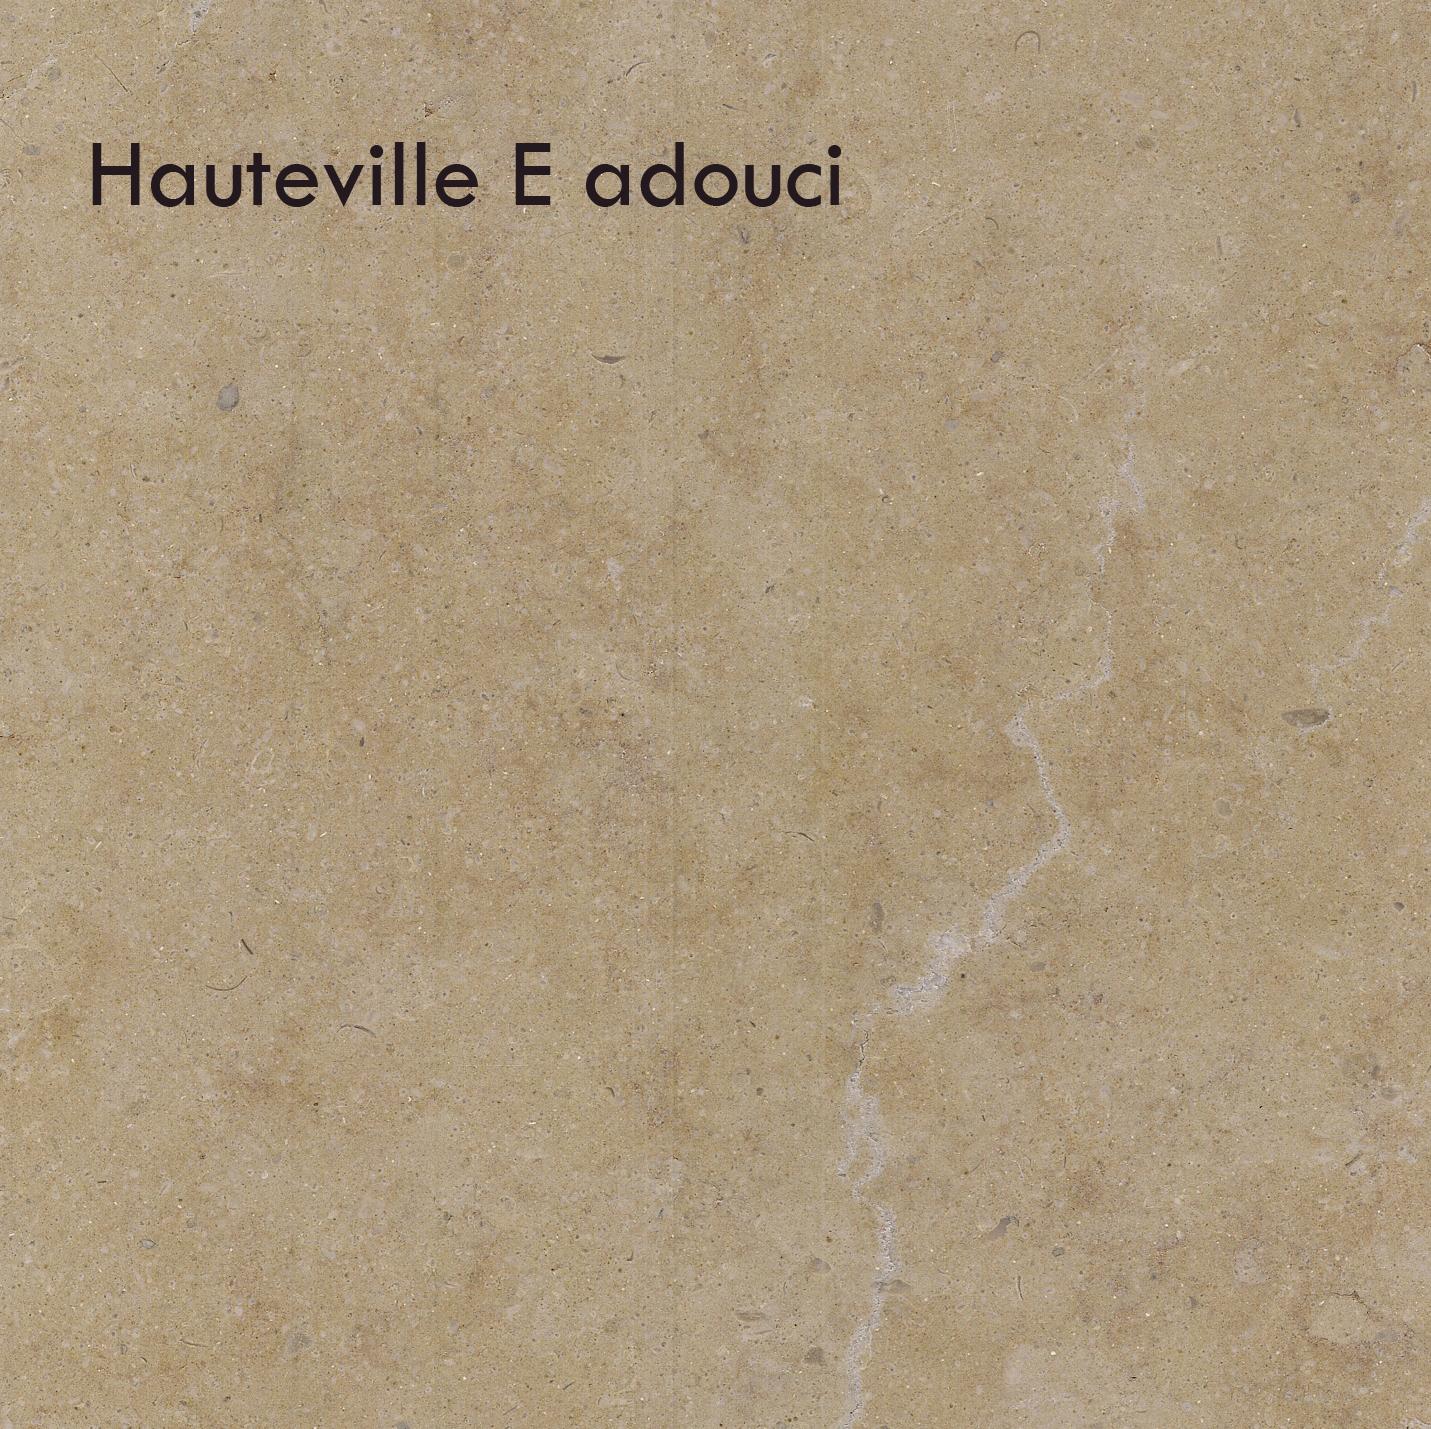 Hauteville E adouci